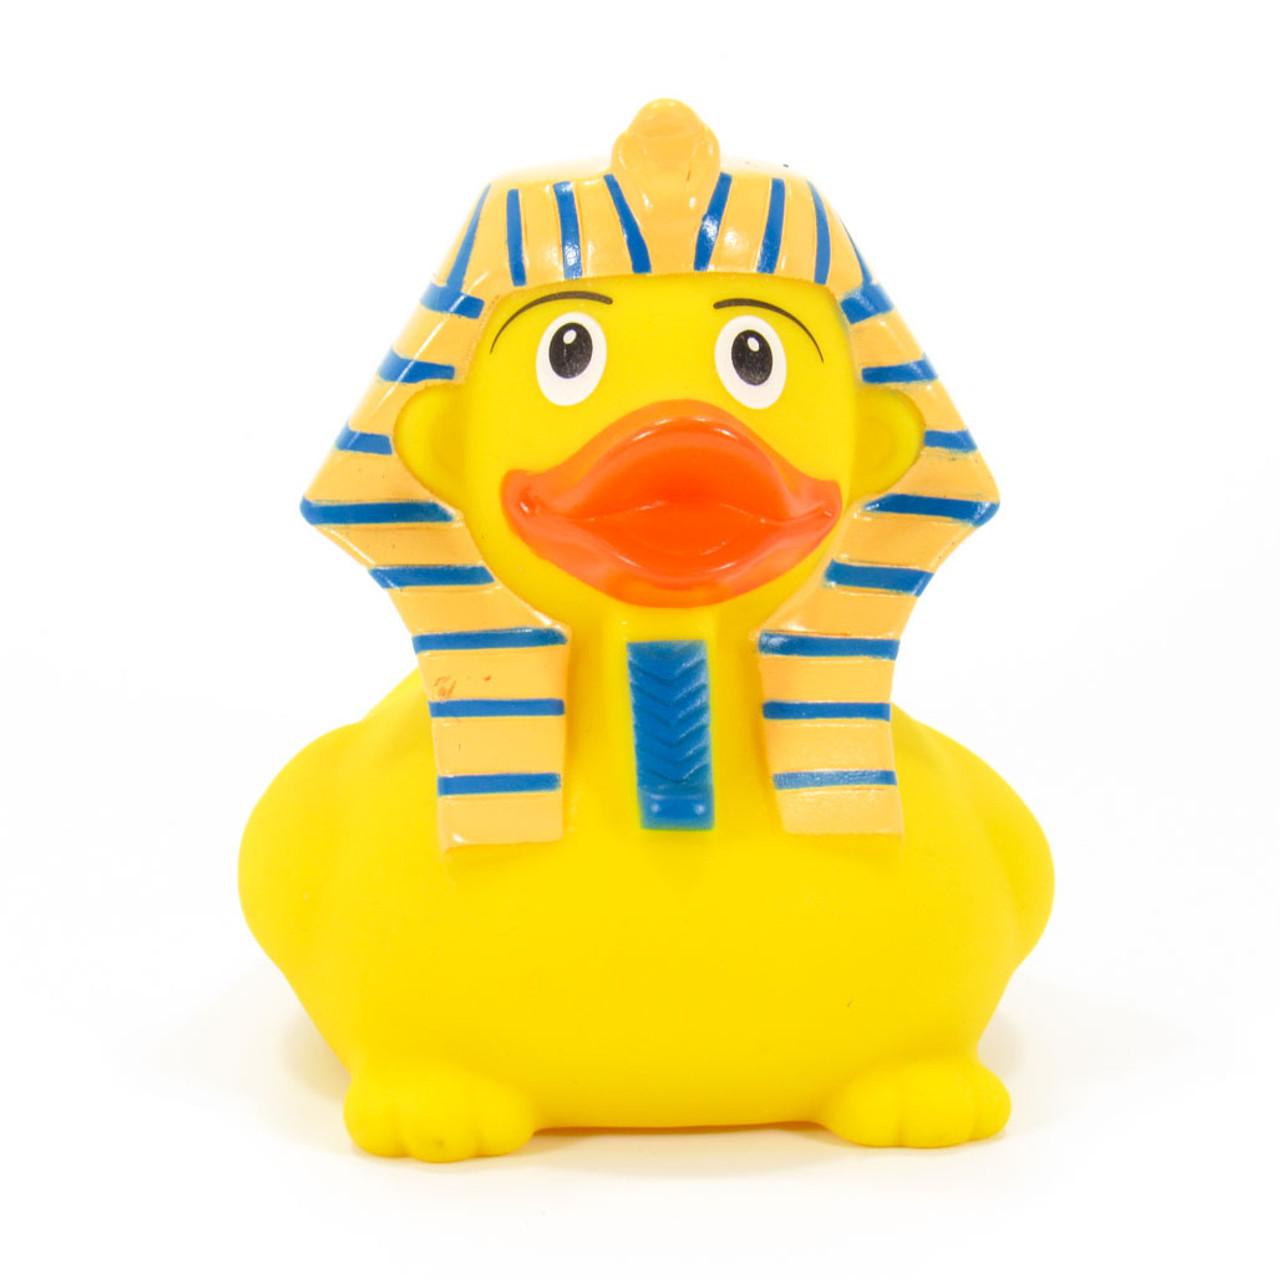 Sphinx Egypt Rubber Duck